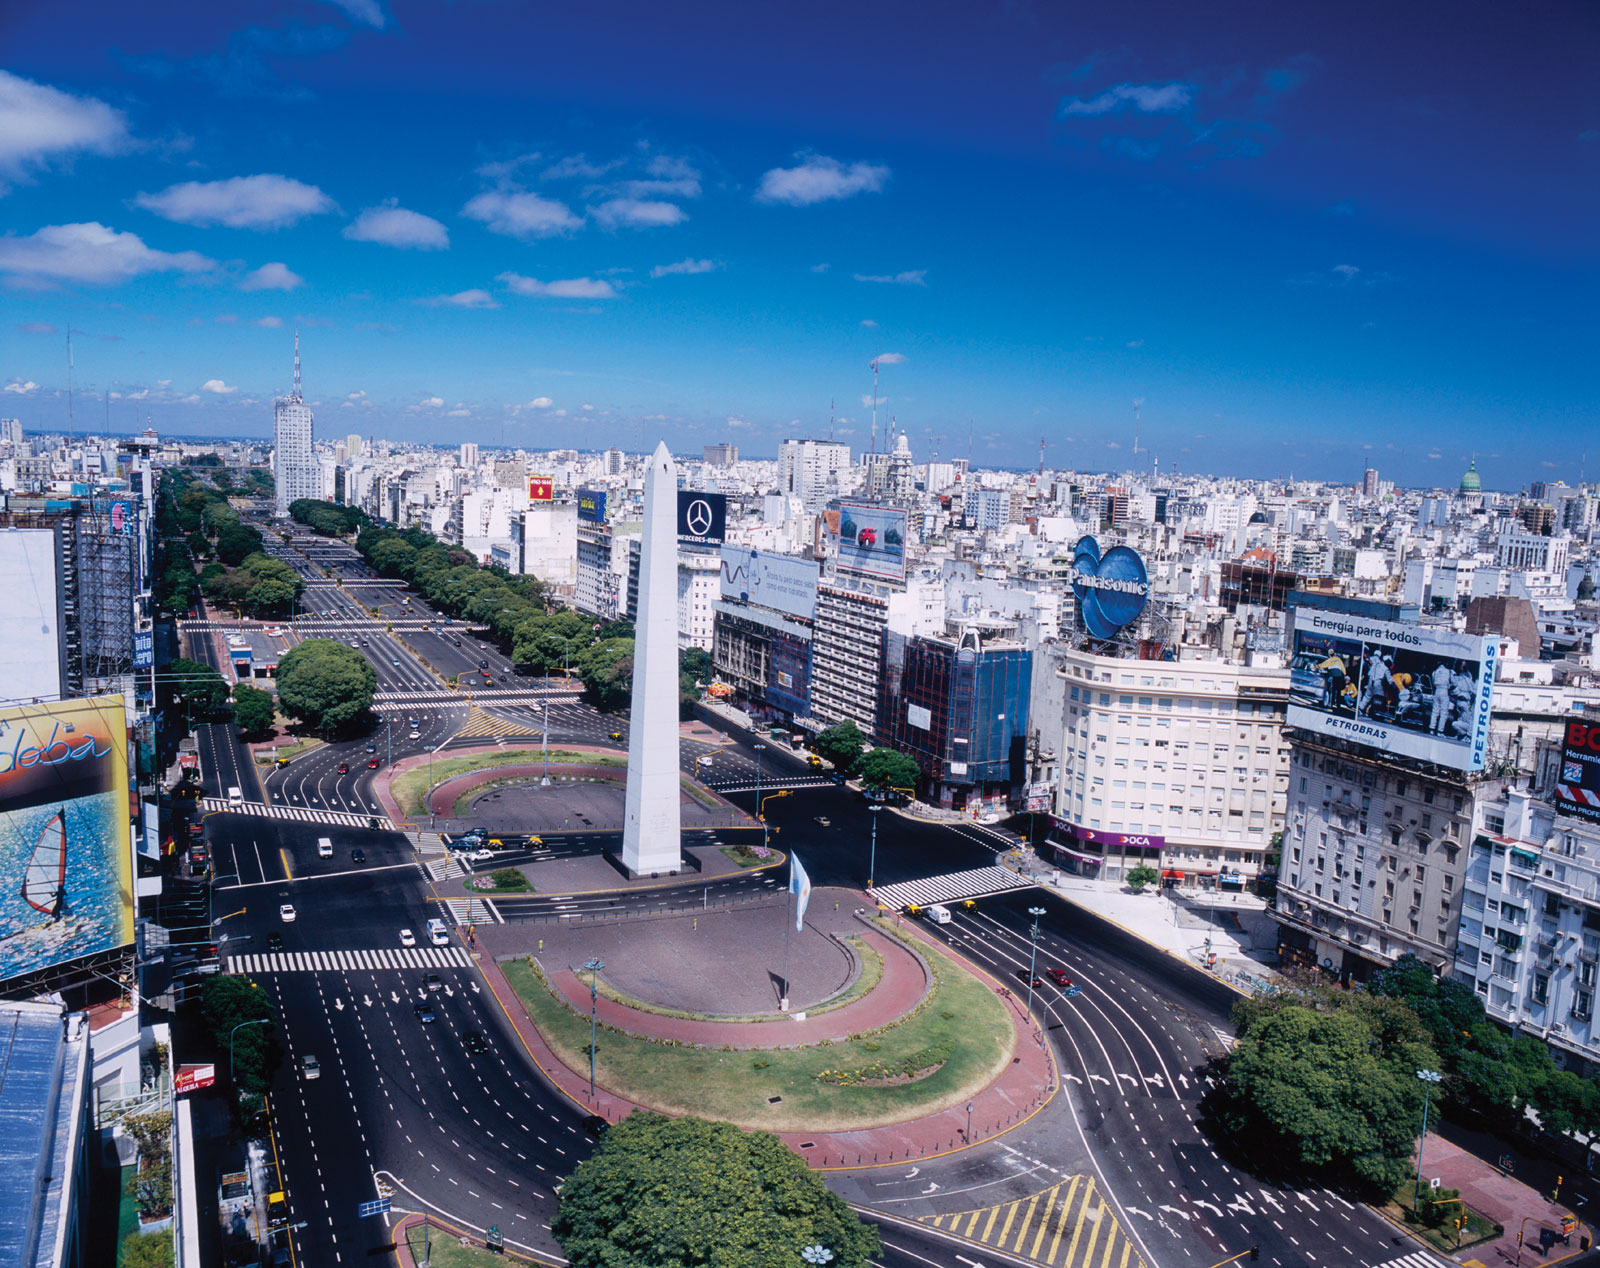 Fotografije glavnih gradova sveta - Page 3 Buenos+aires+argentina+city+view